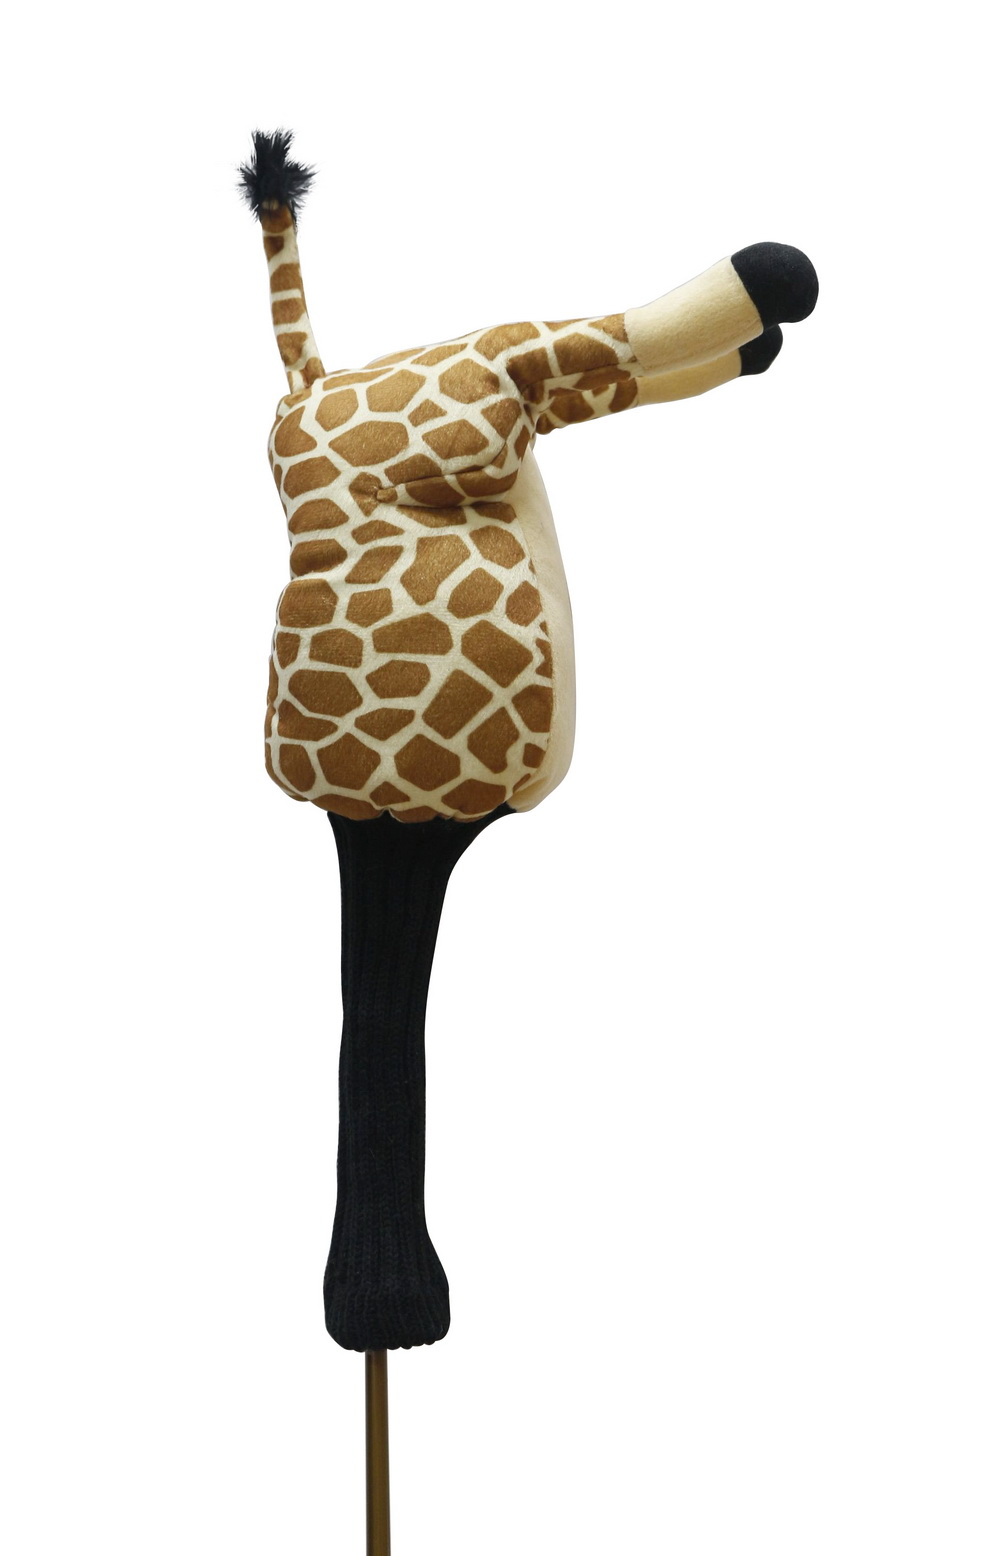 Butthead-Giraffe-Head-Cover_01.jpg